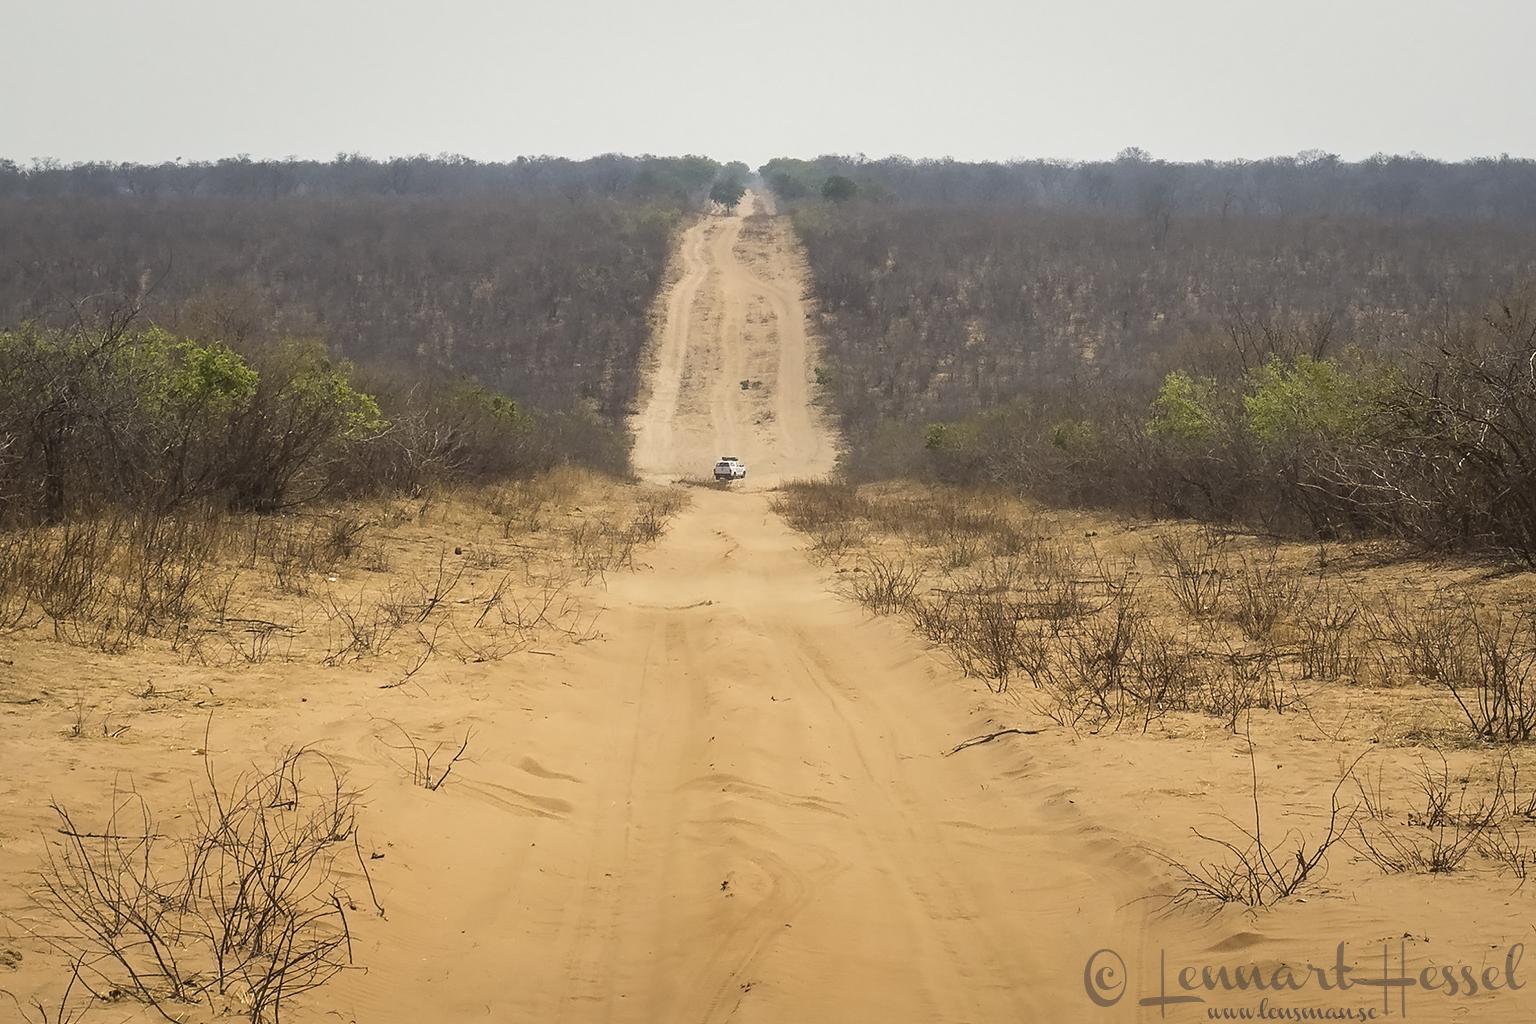 Negotiating the sand dunes In Chobe National Park, Botswana